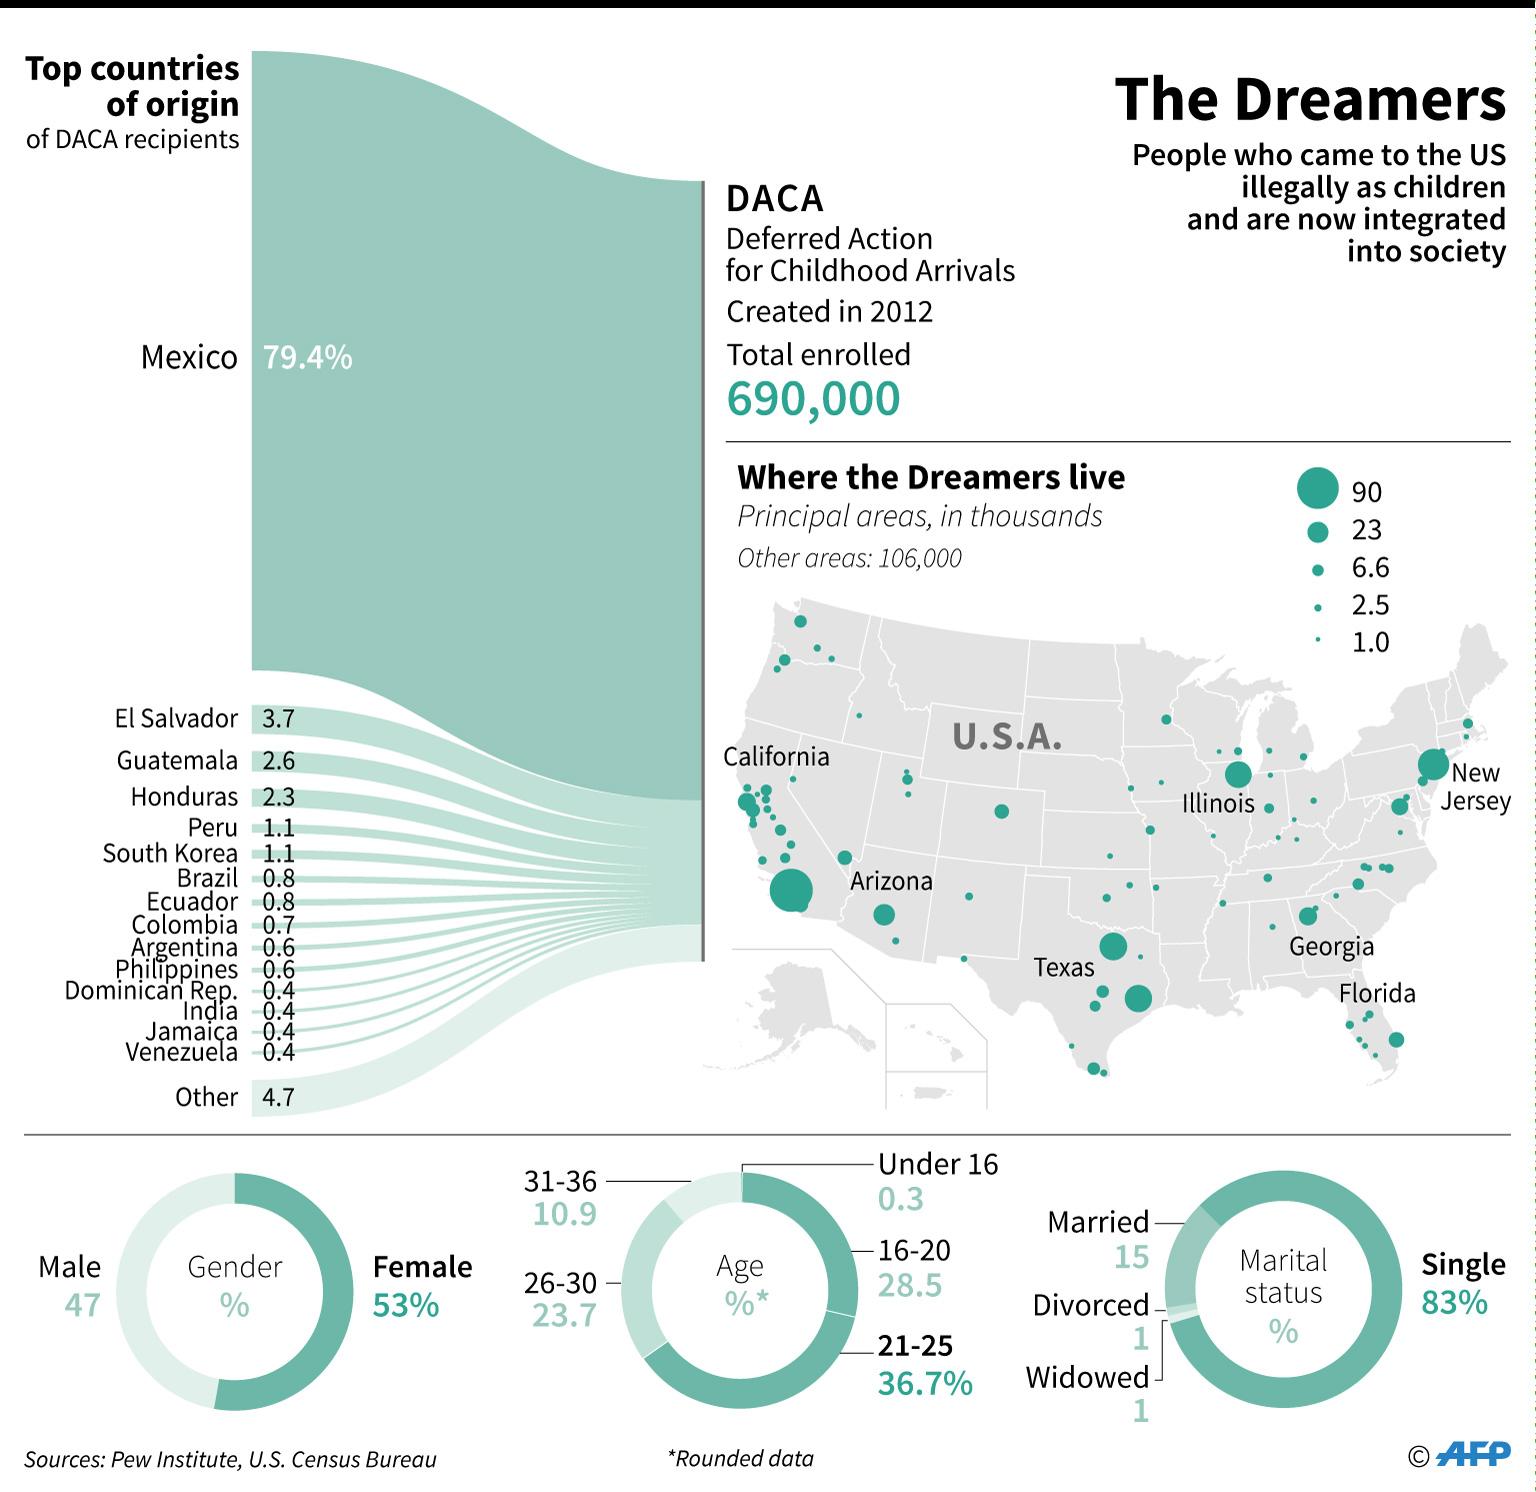 merit-based immigration DACA dreamers